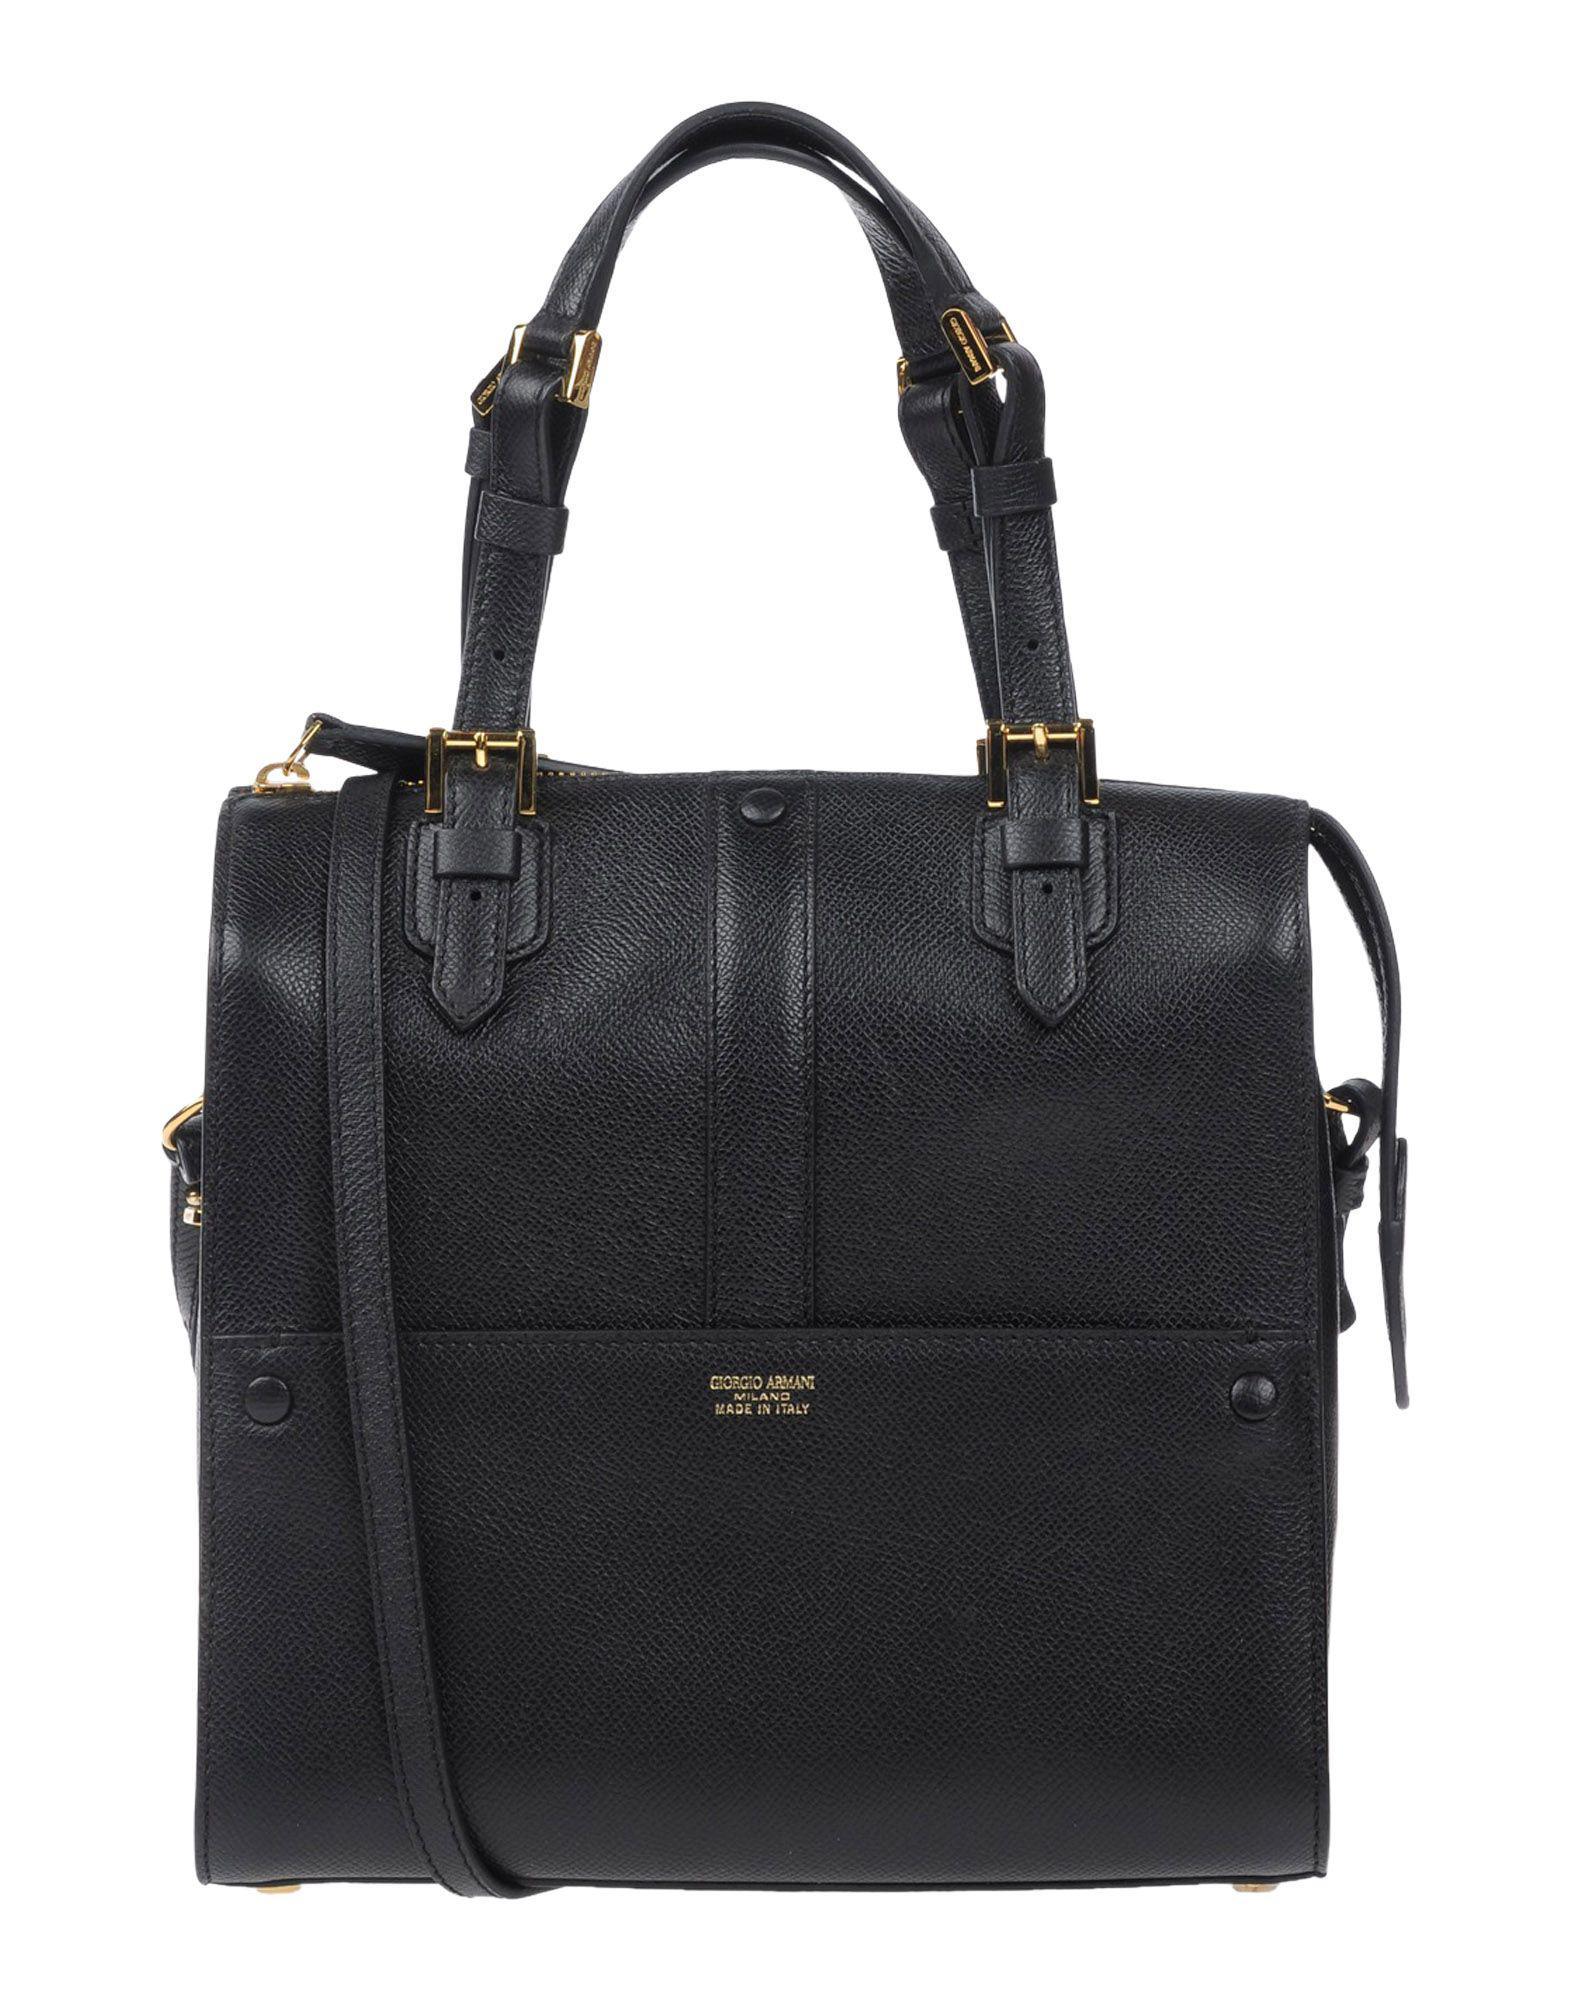 48c17faa1cd5 Lyst - Giorgio Armani Handbag in Black